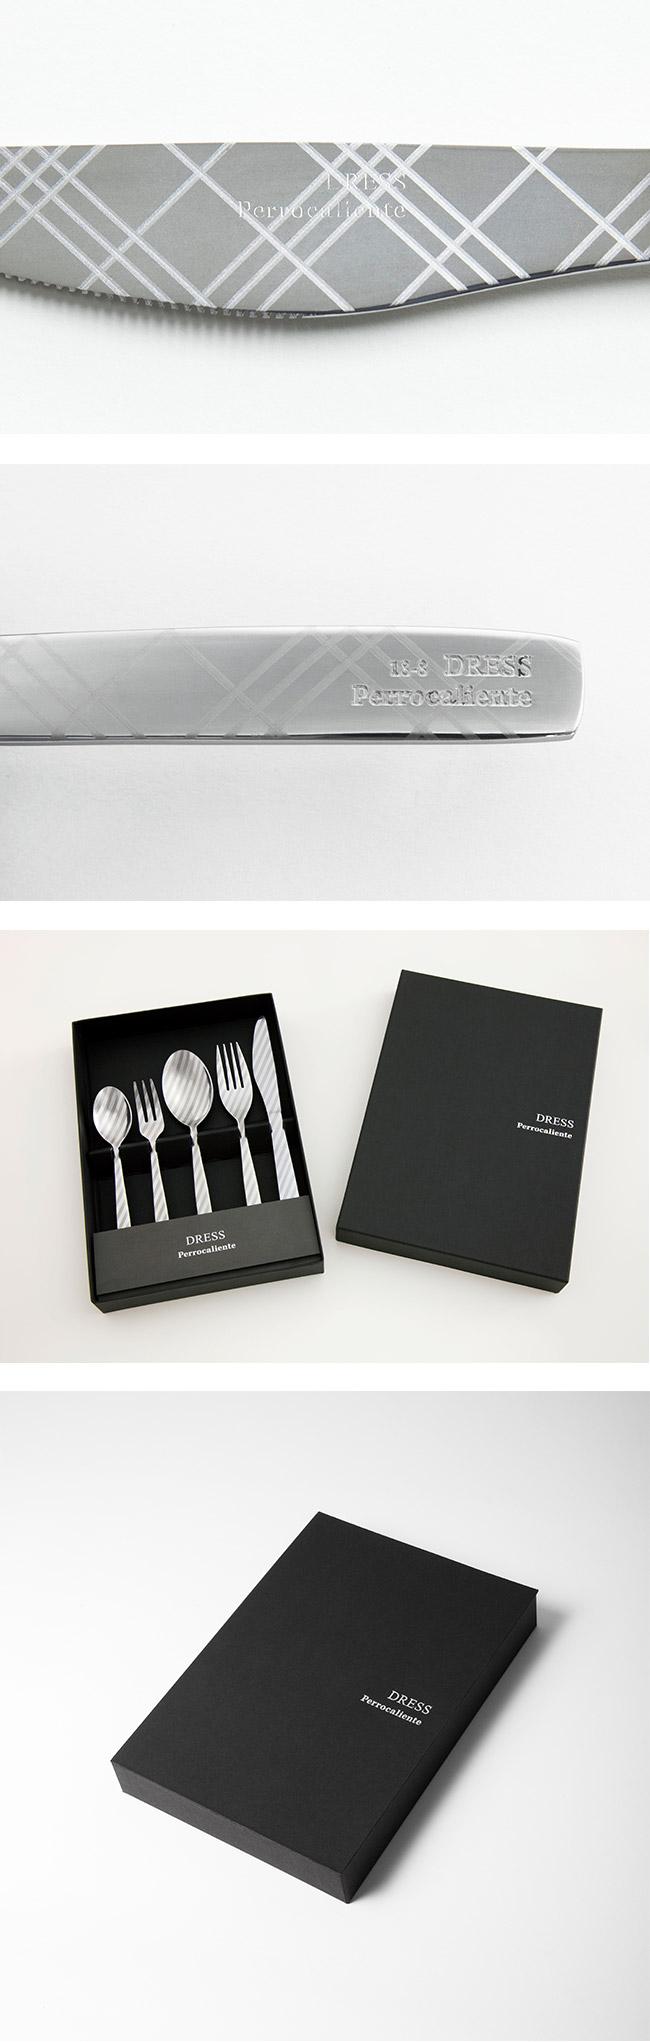 Perrocaliente Dress Gift Set 銀色盒裝餐具組 兩對組 方格 (湯匙*2+叉子*2)